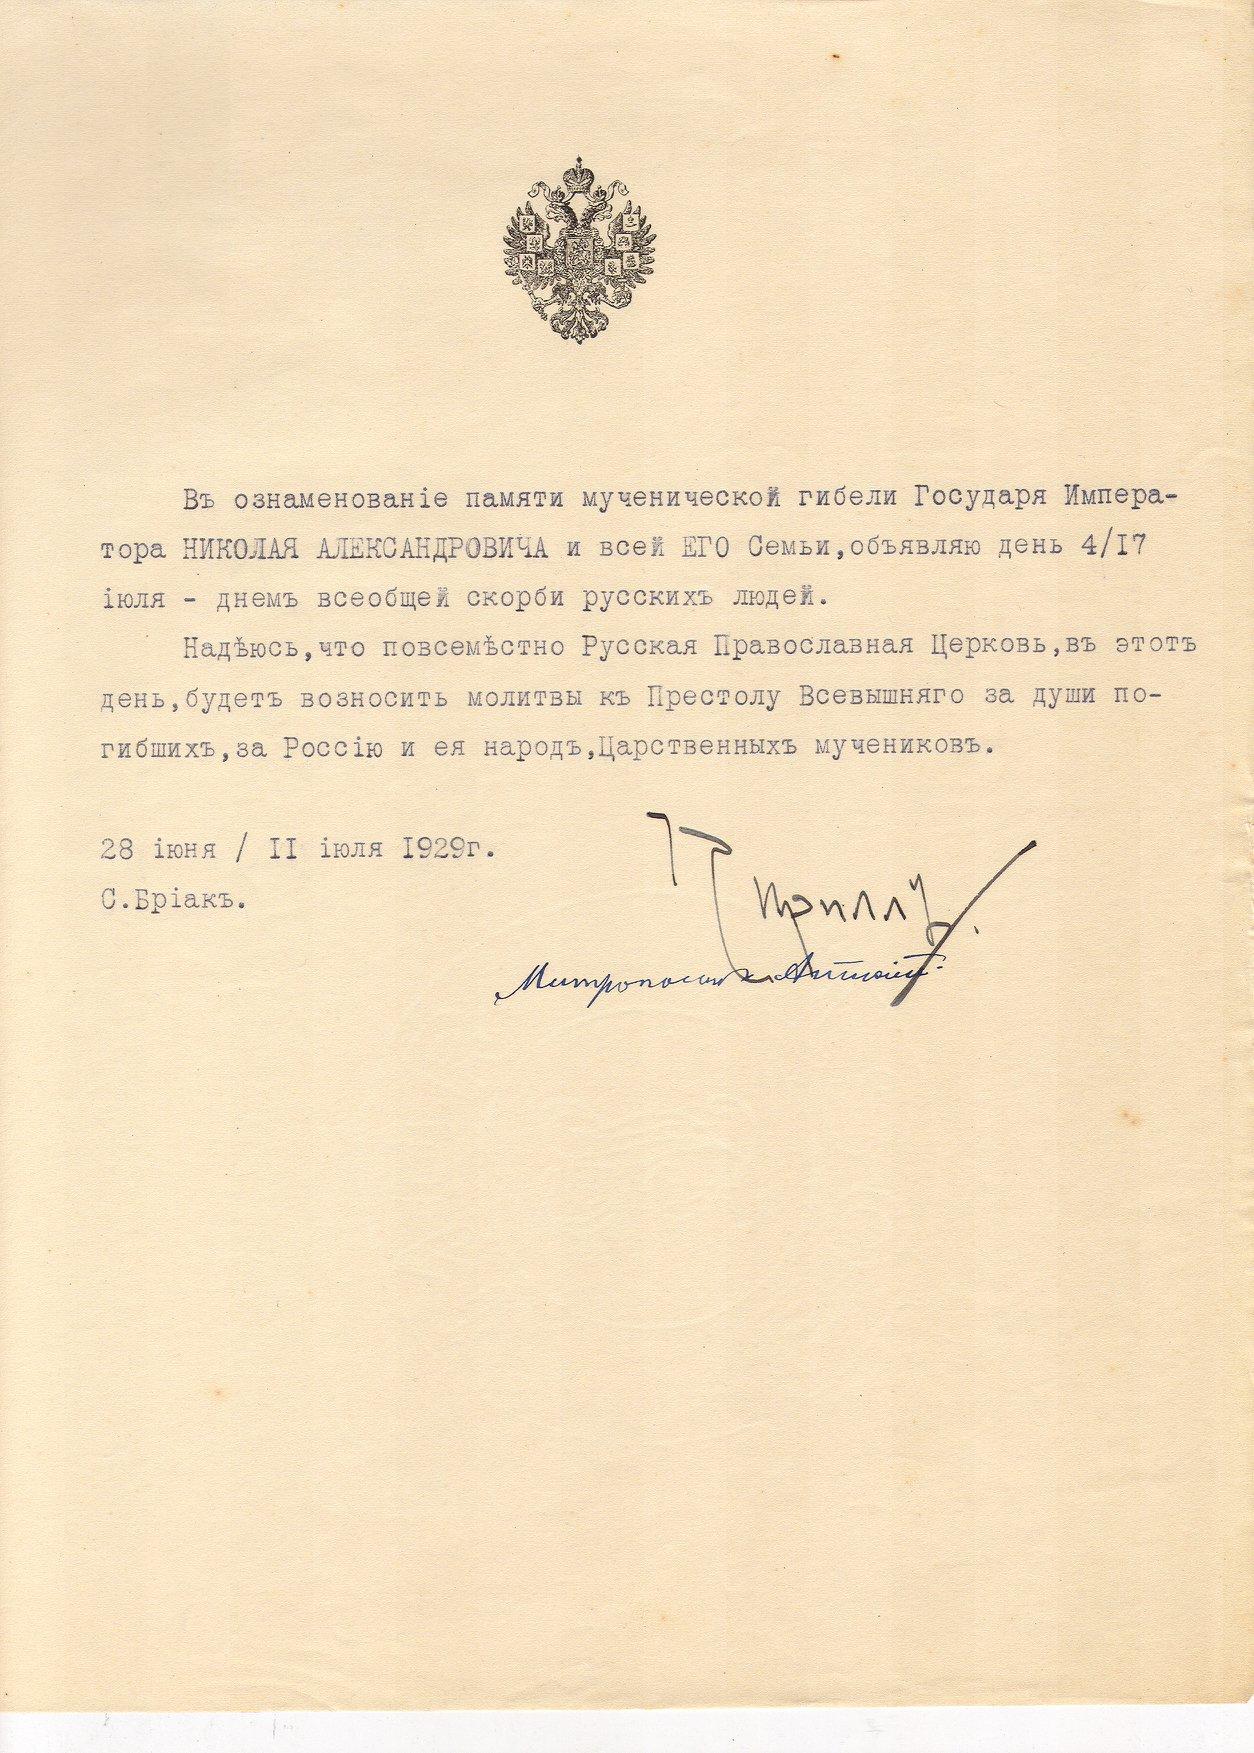 KirillManifesto.jpg